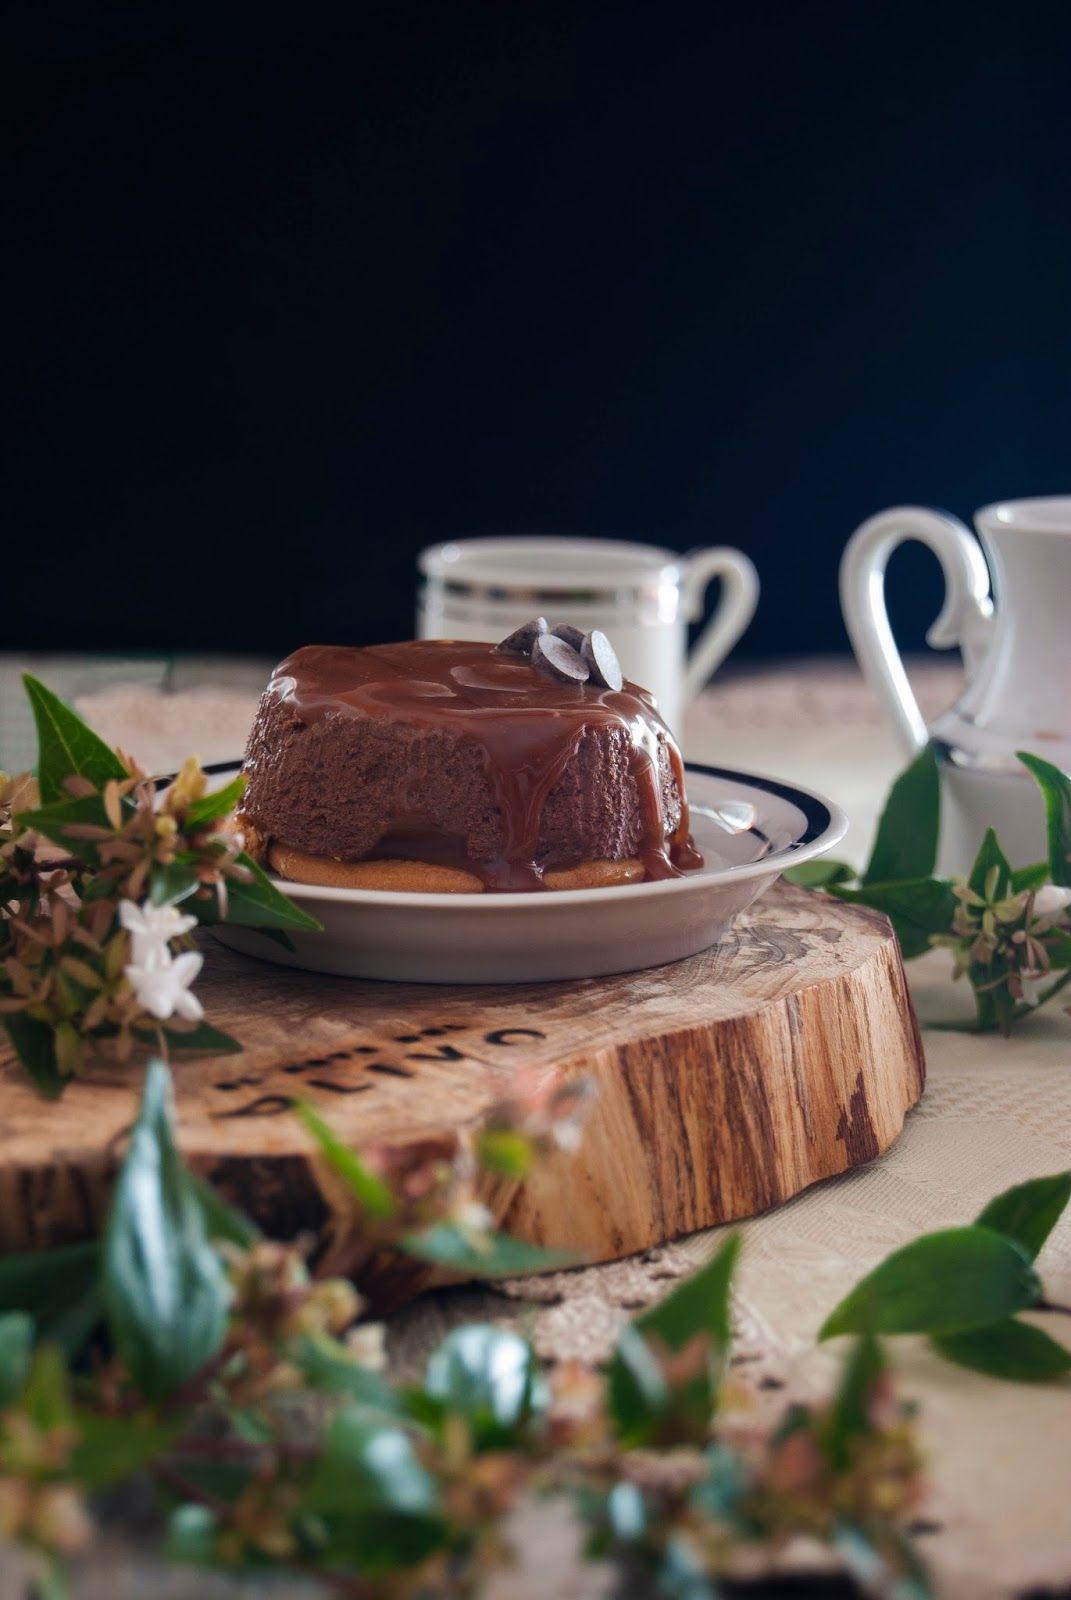 La asaltante de dulces: Receta de falsos flanes de chocolate, galleta y caramelo/ No bake chocolate,cookies & caramel little cakes